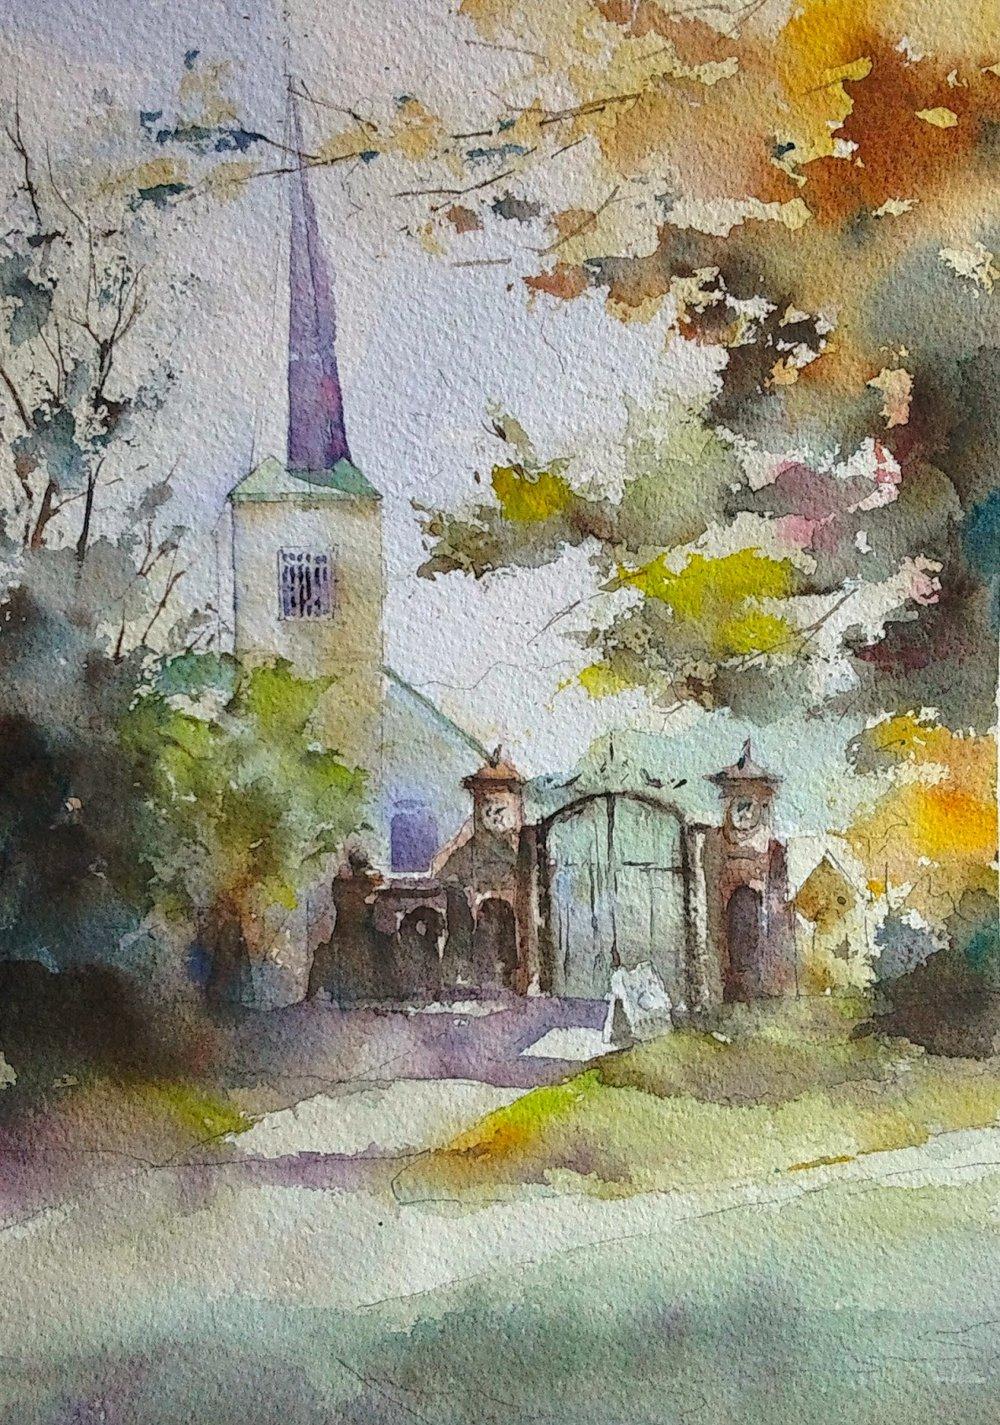 First Church, Cambridge, MA from Harvard Yard